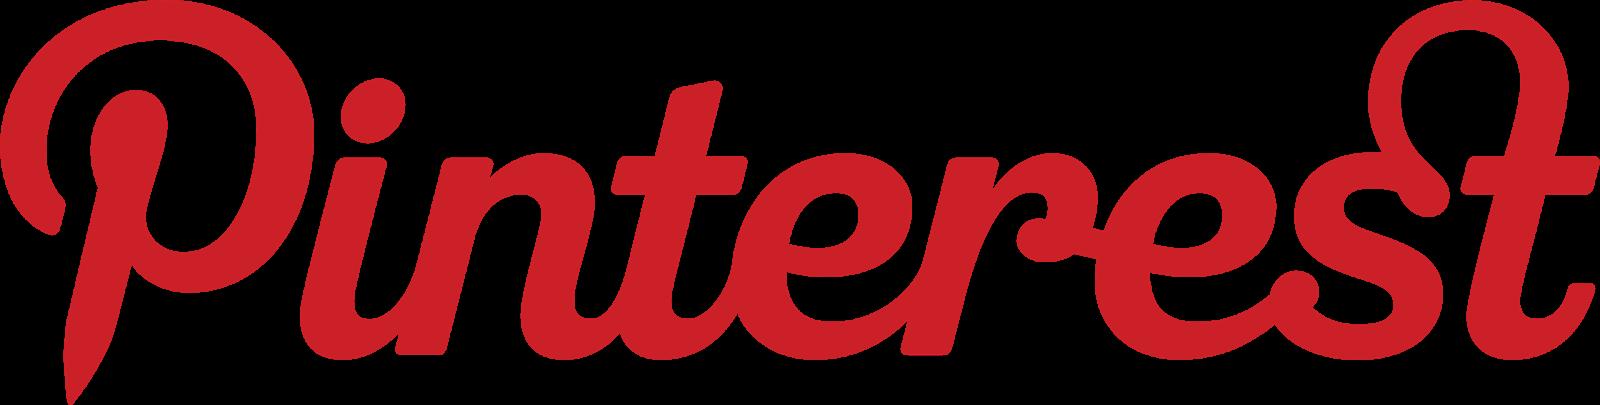 http://es.pinterest.com/missfabulas/pins/